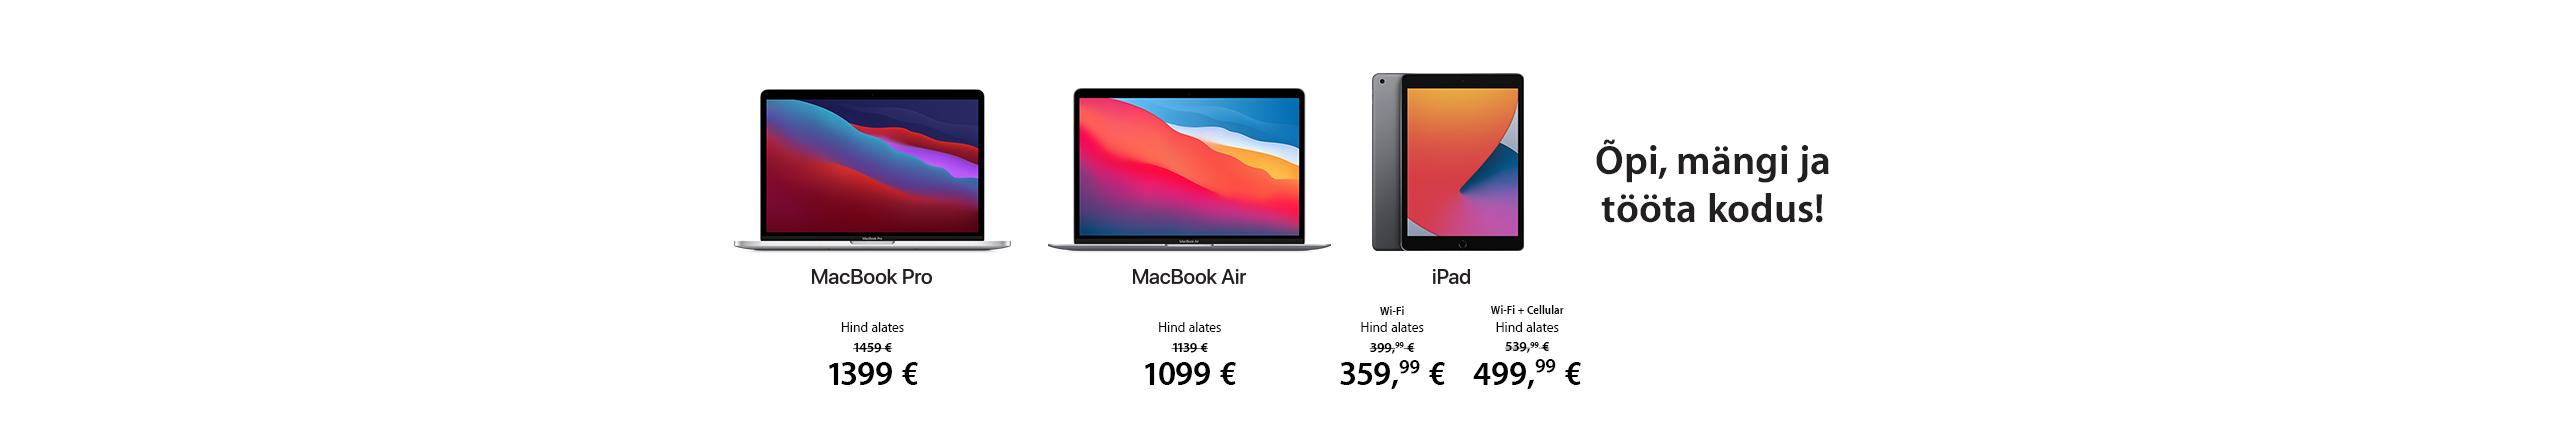 FPS Apple iPad, MacBook Air & MacBook Pro special offers